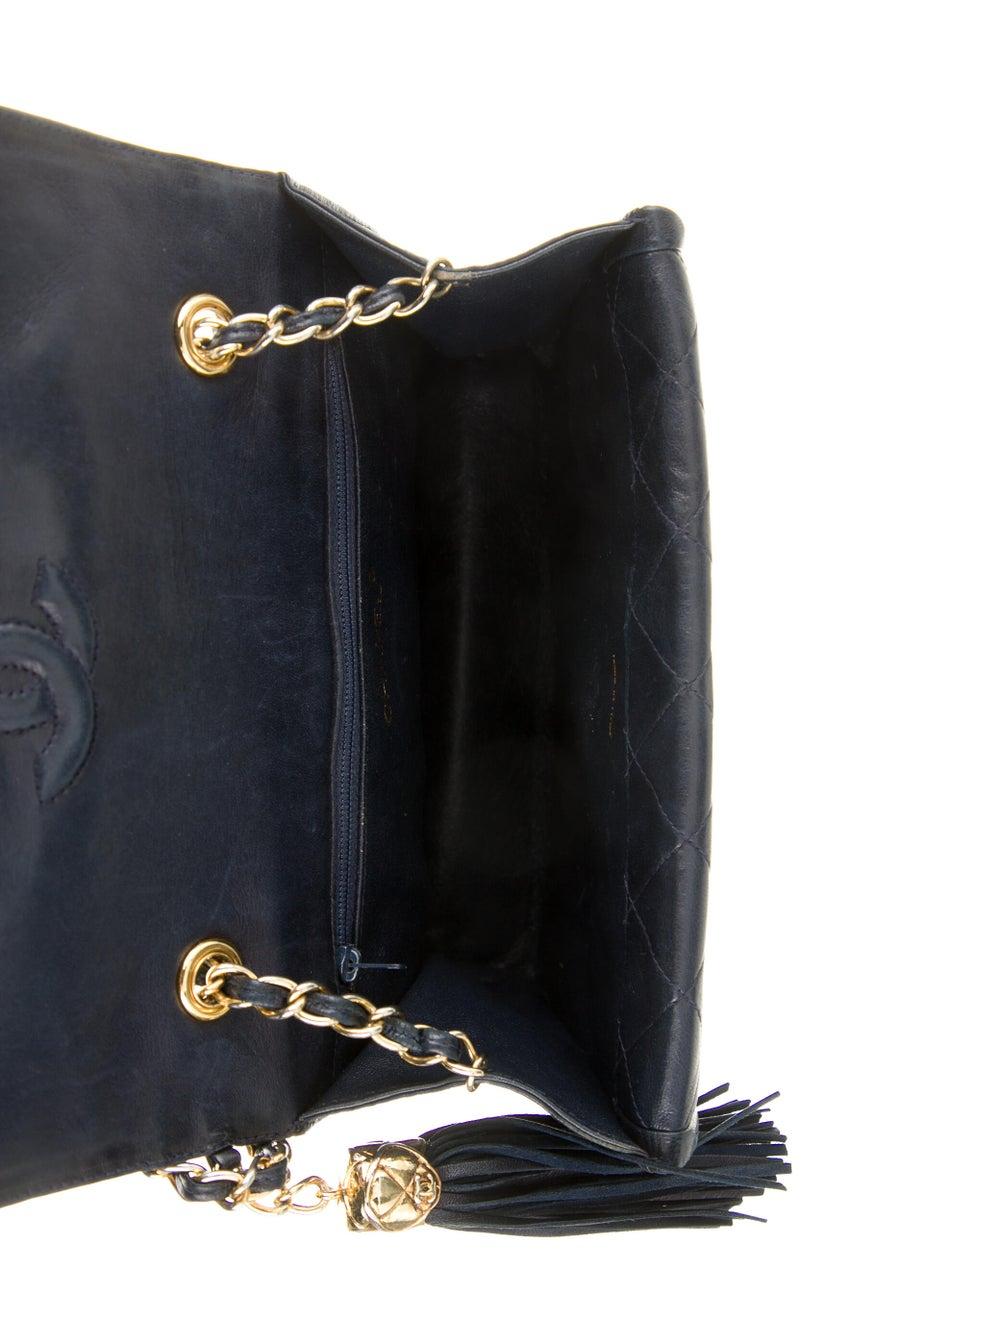 Chanel Vintage Mini Quilted Flap Bag Blue - image 5